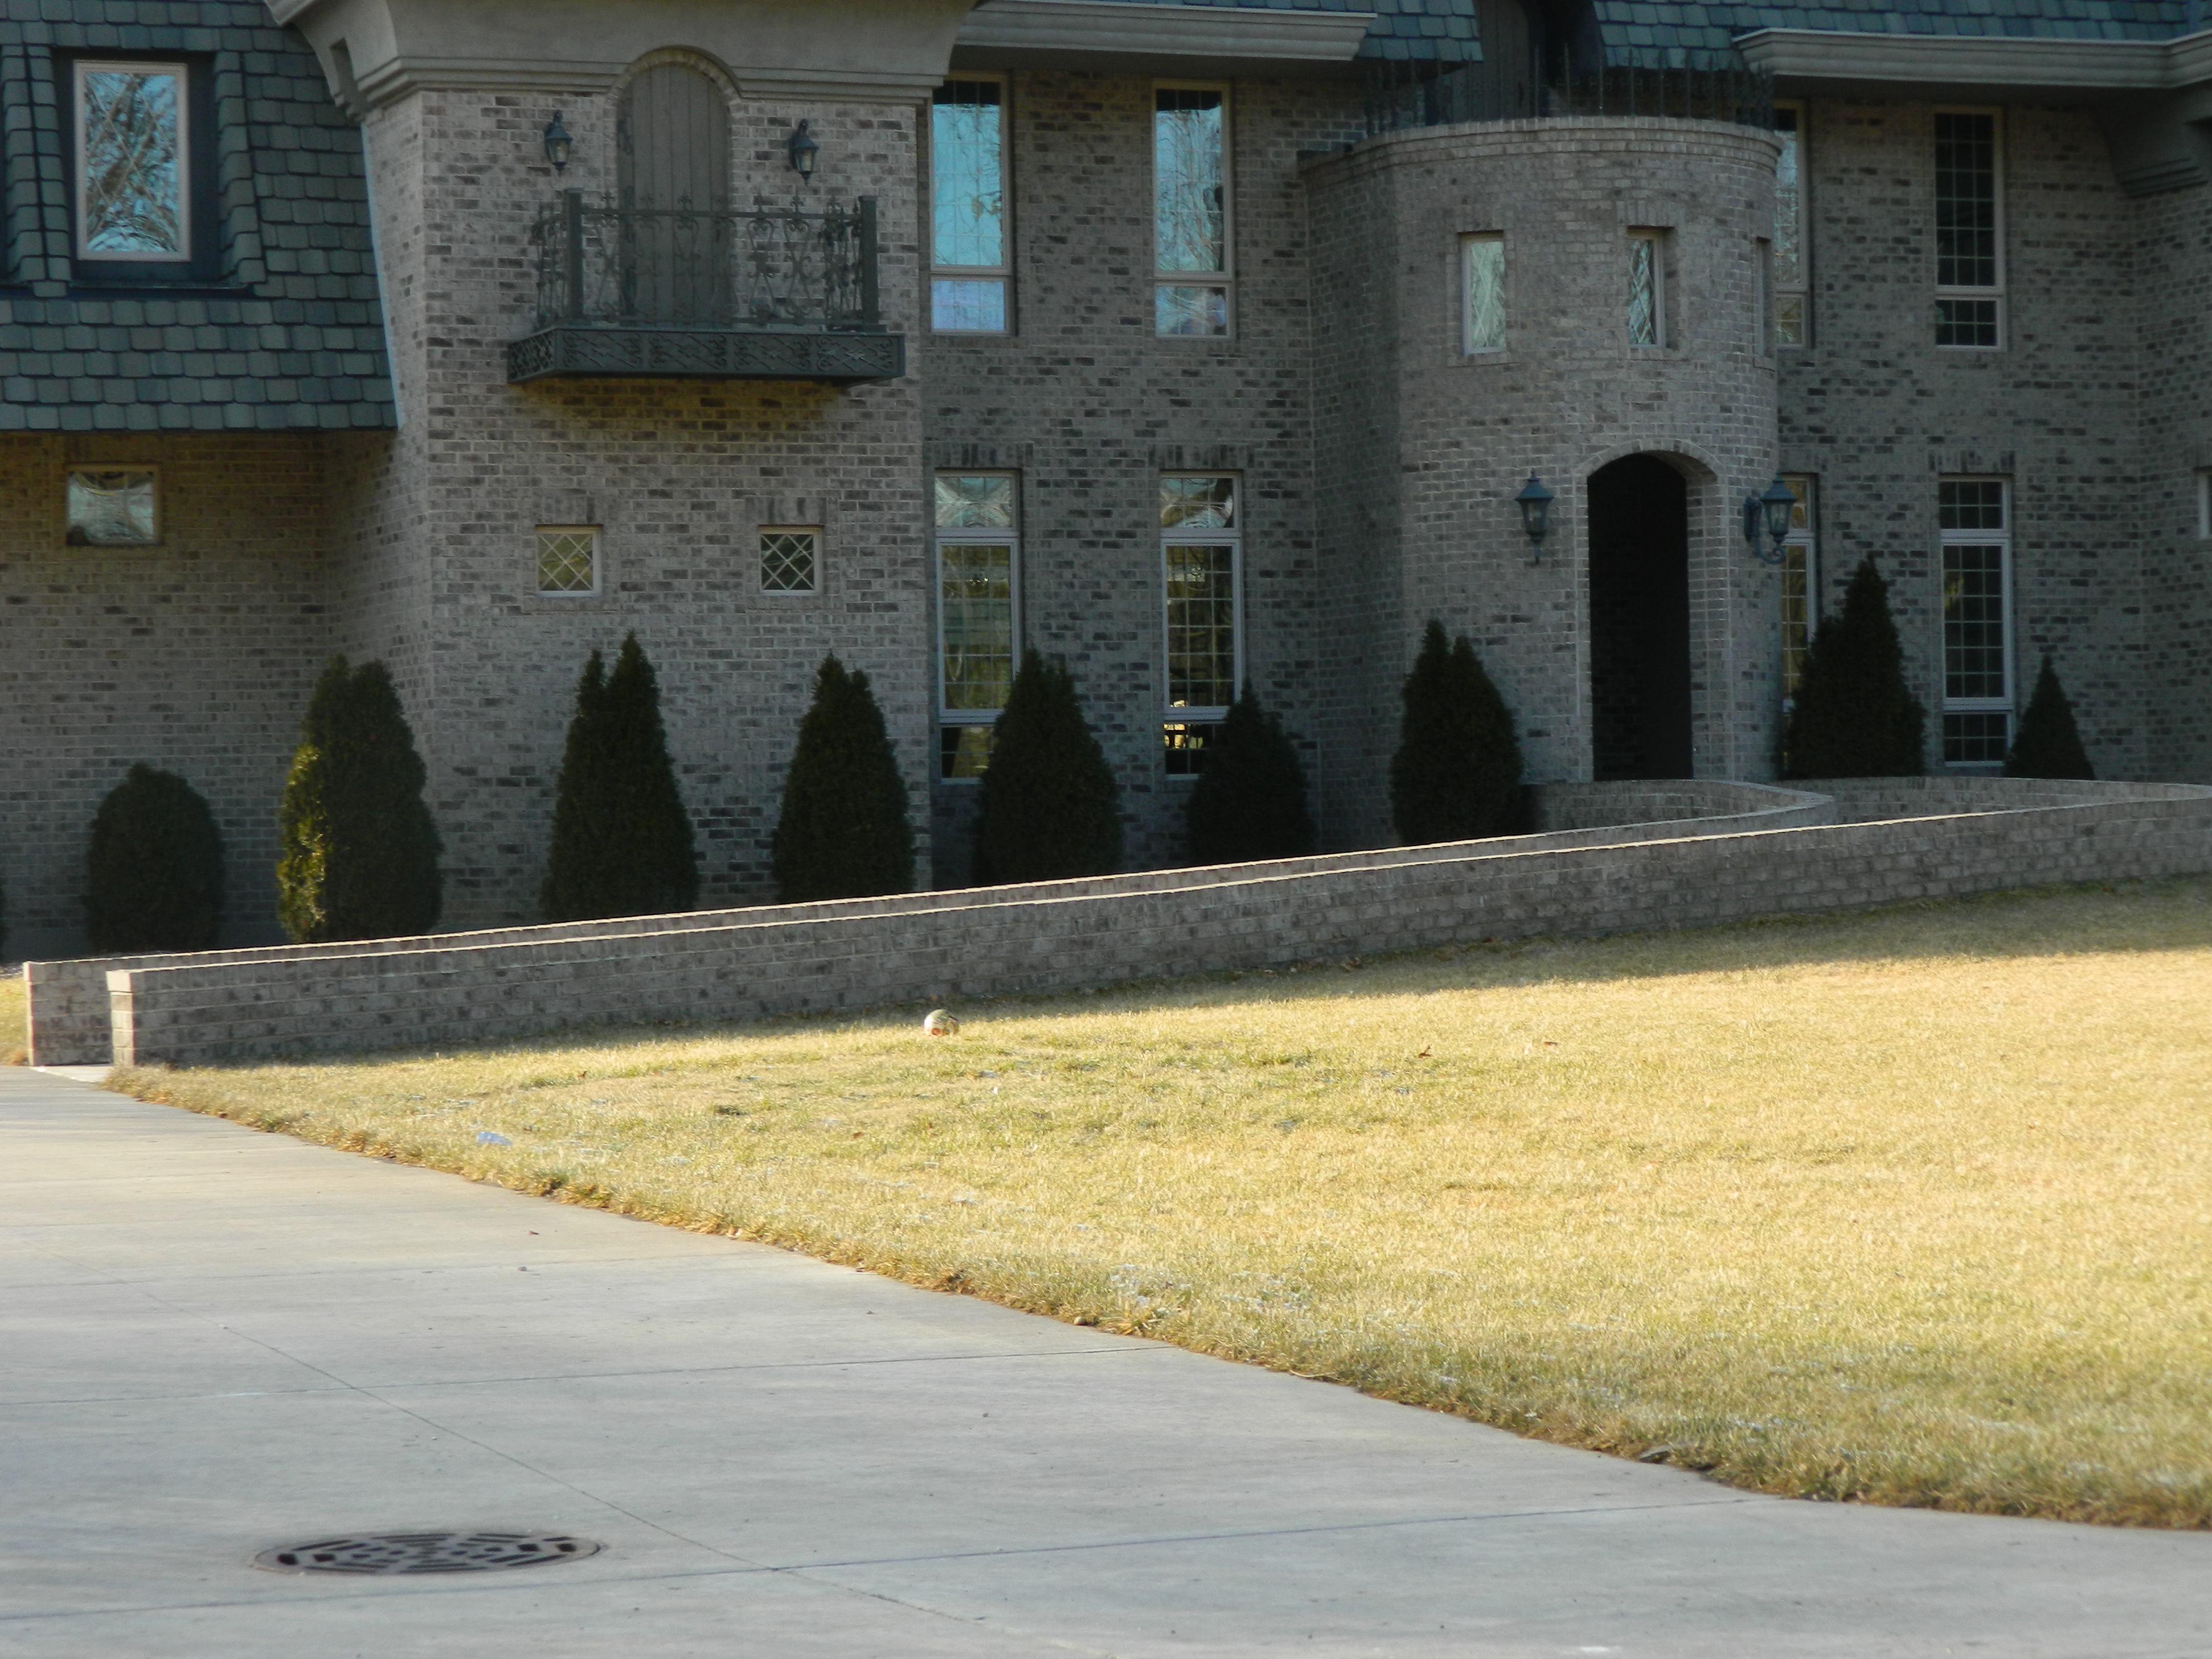 House looks like a castle for sale